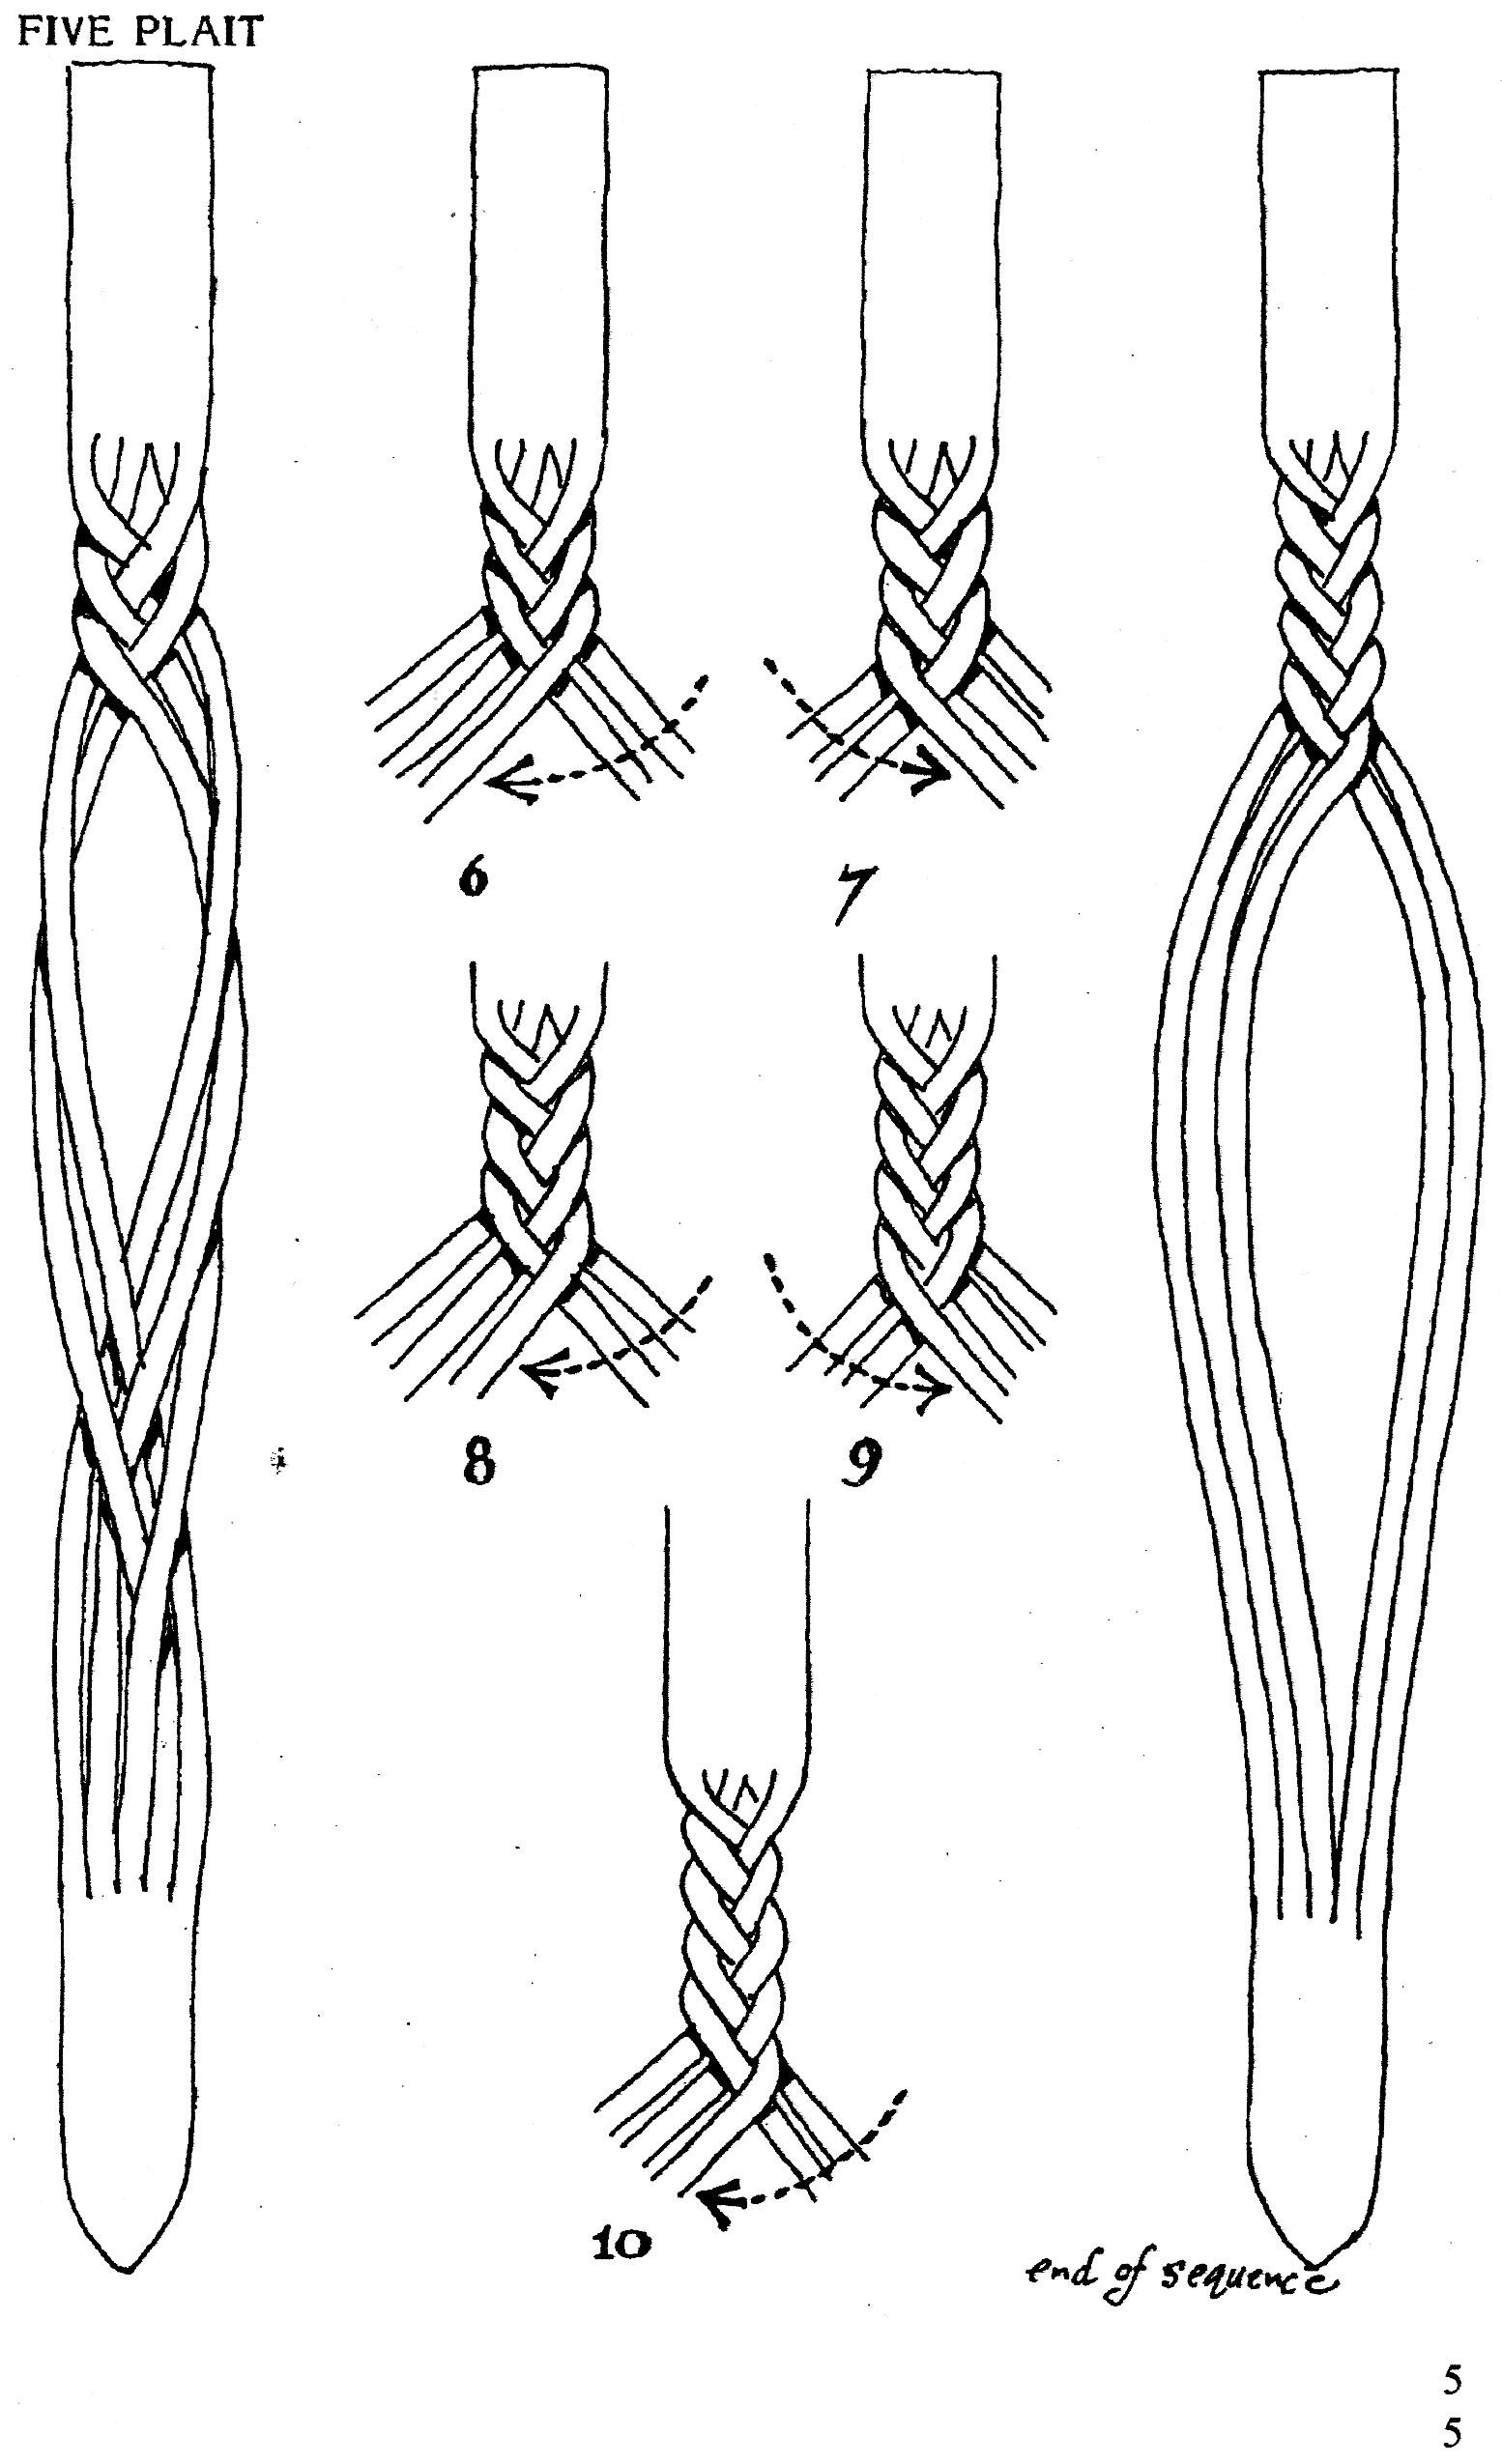 ladder braid diagram dynisco pressure transducer wiring 7 strand steps bing images